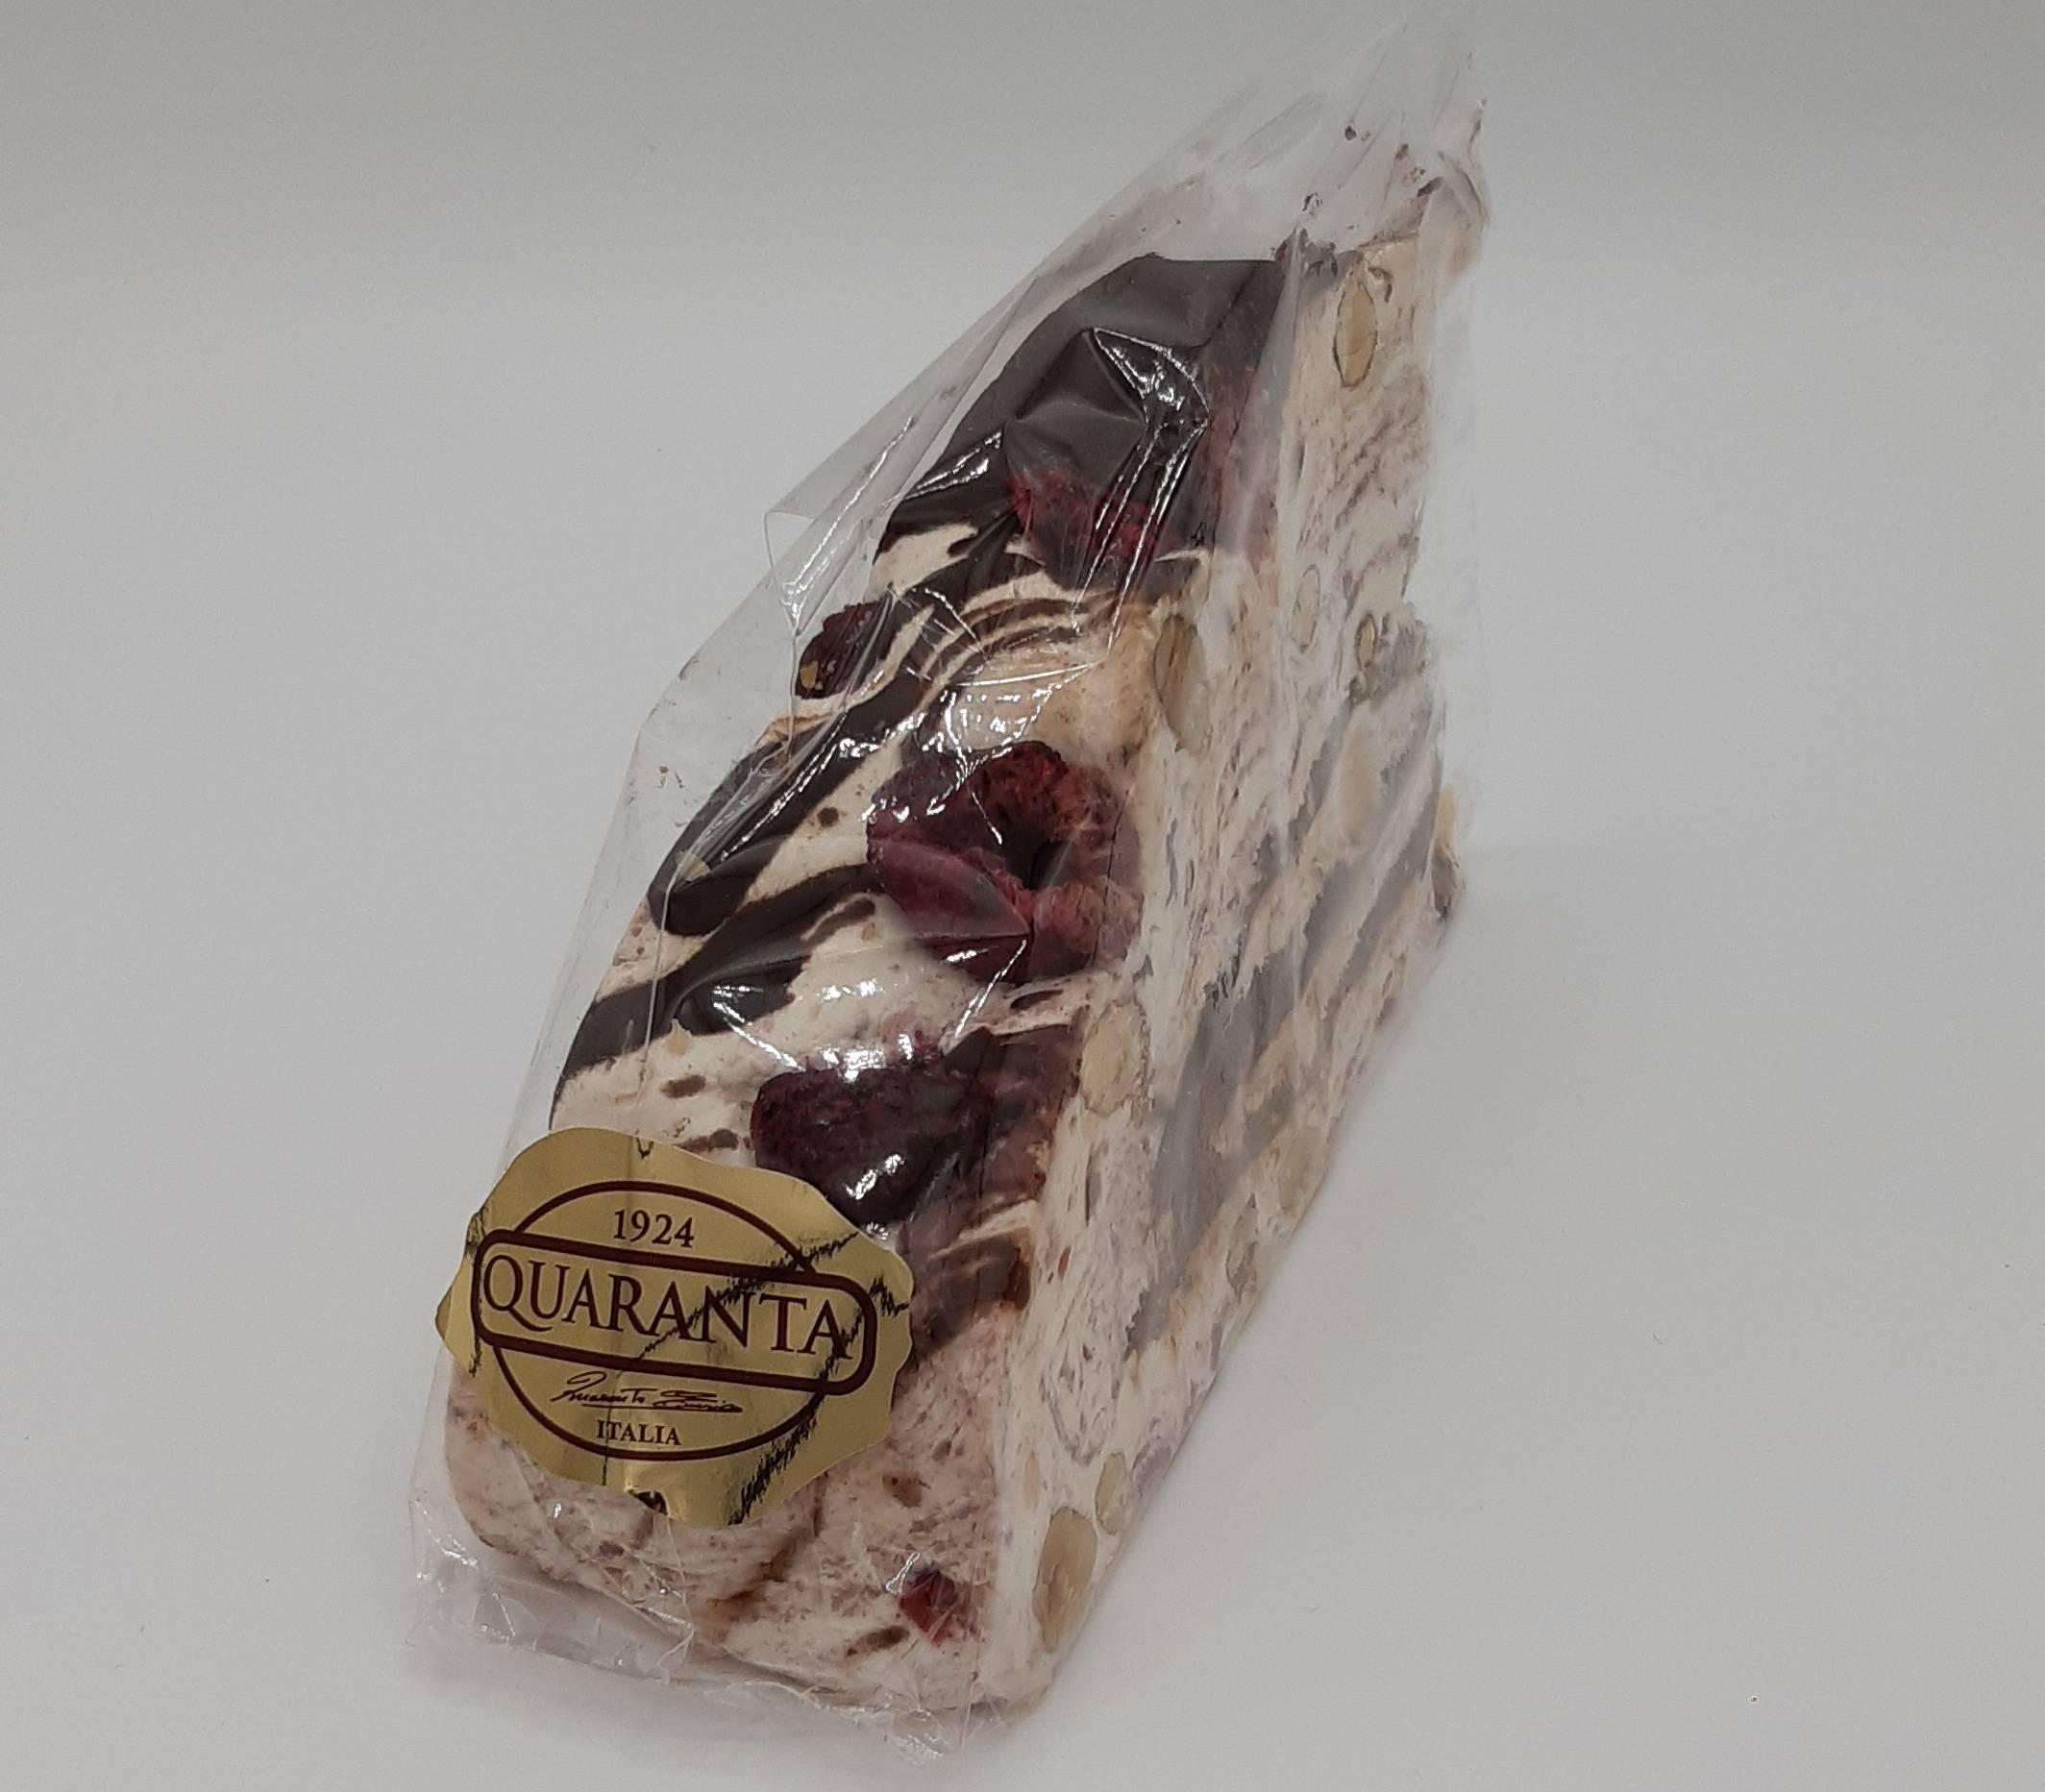 Quaranta Raspberry & Chocolate Nougat Other